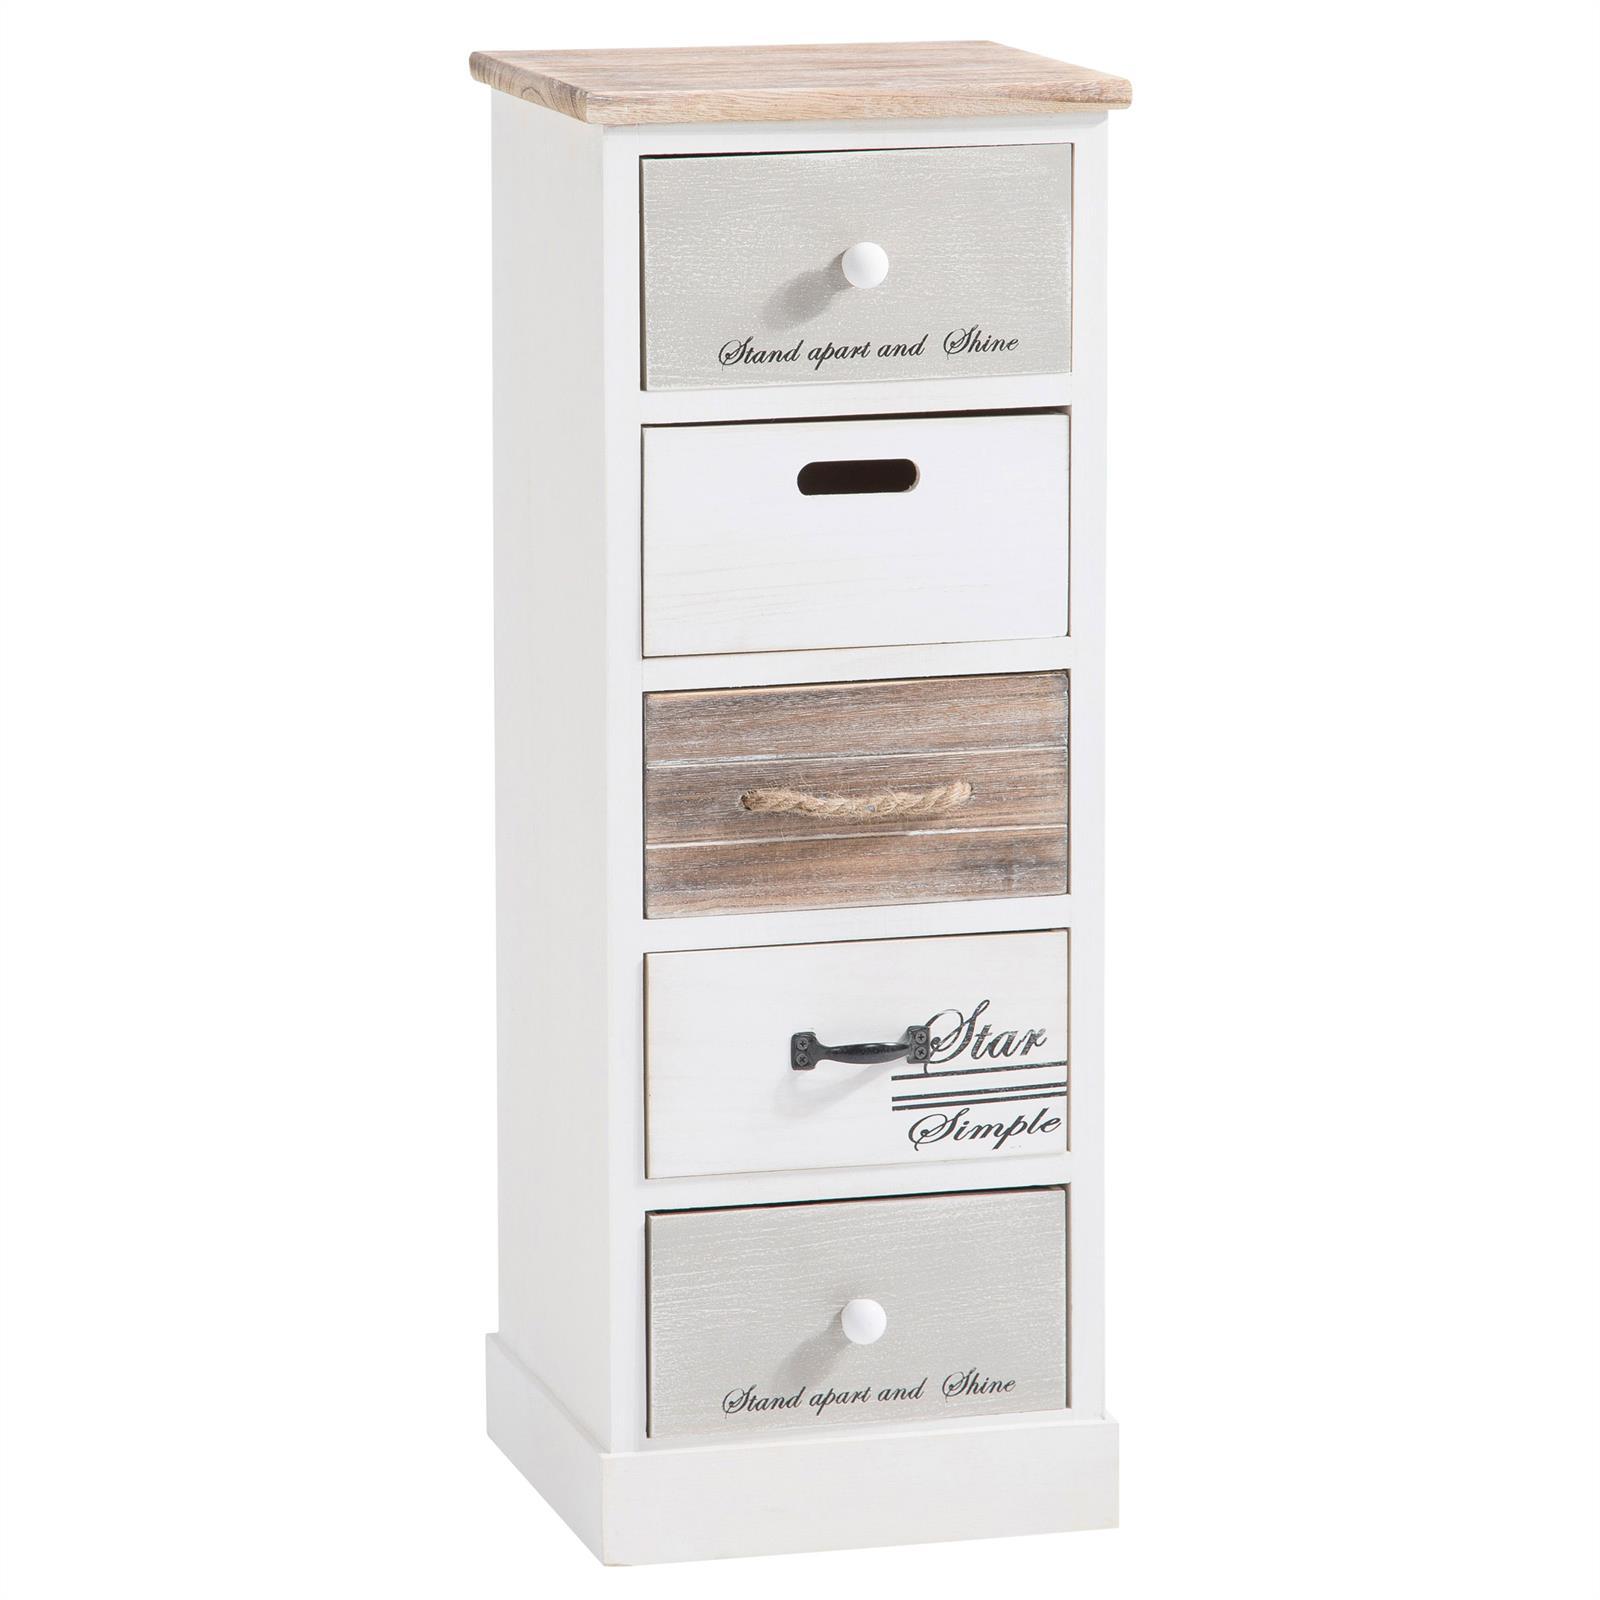 Chiffonnier salva 5 tiroirs blanc mobil meubles - Chiffonnier blanc 5 tiroirs ...